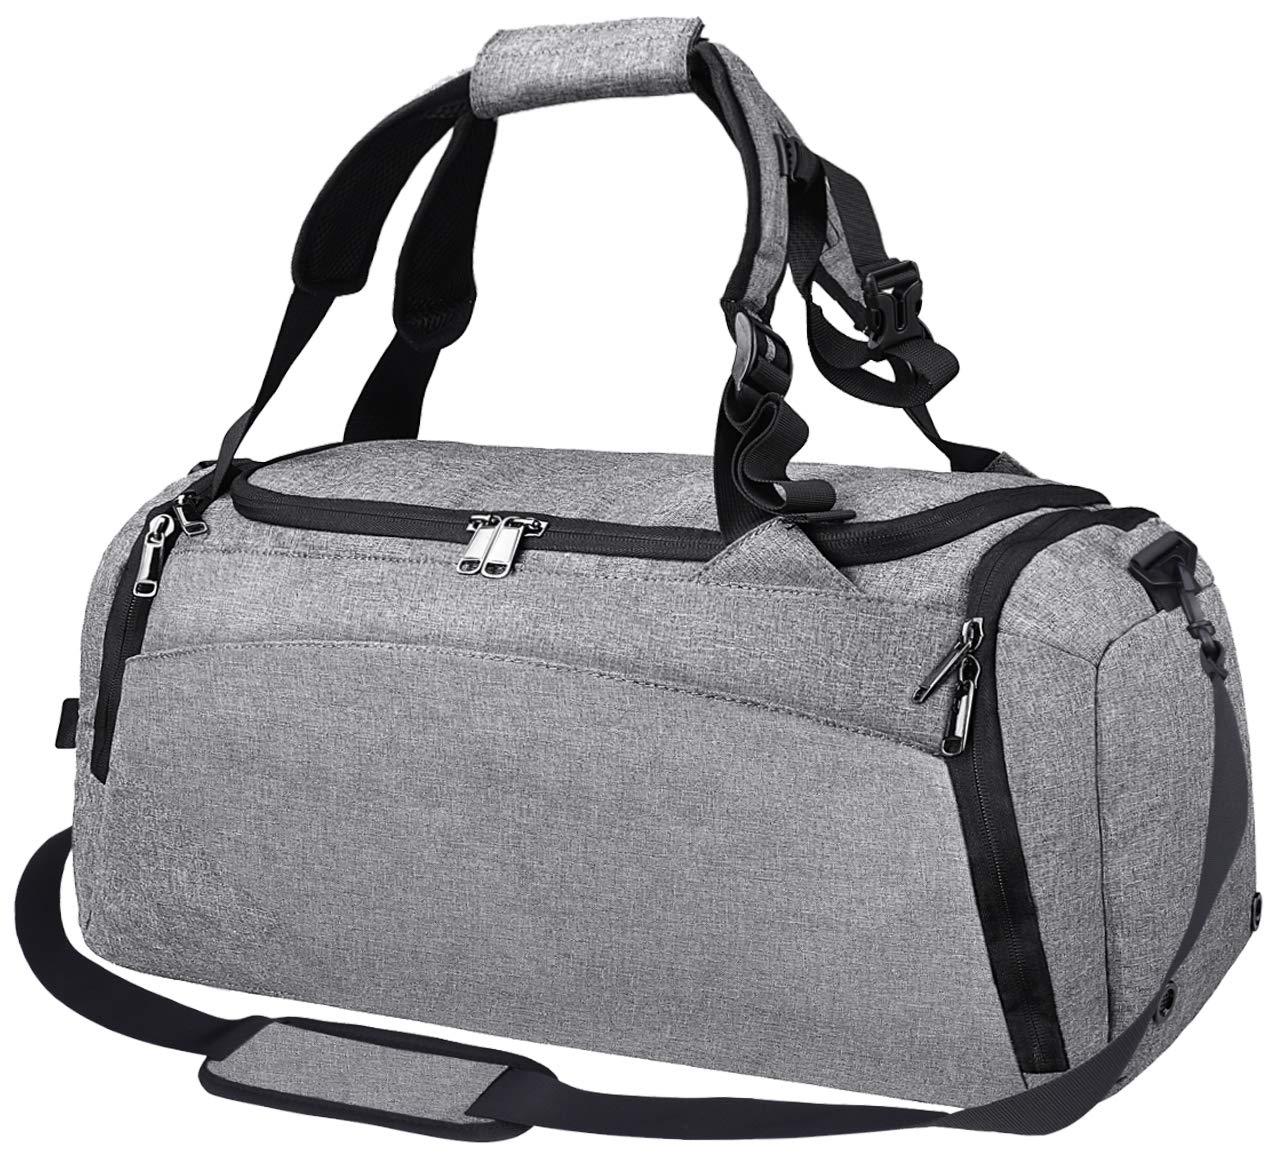 97a77c0d4e8b Details about Gym Duffle Bag Waterproof Travel Weekender Bag for Men Women Duffel  Bag